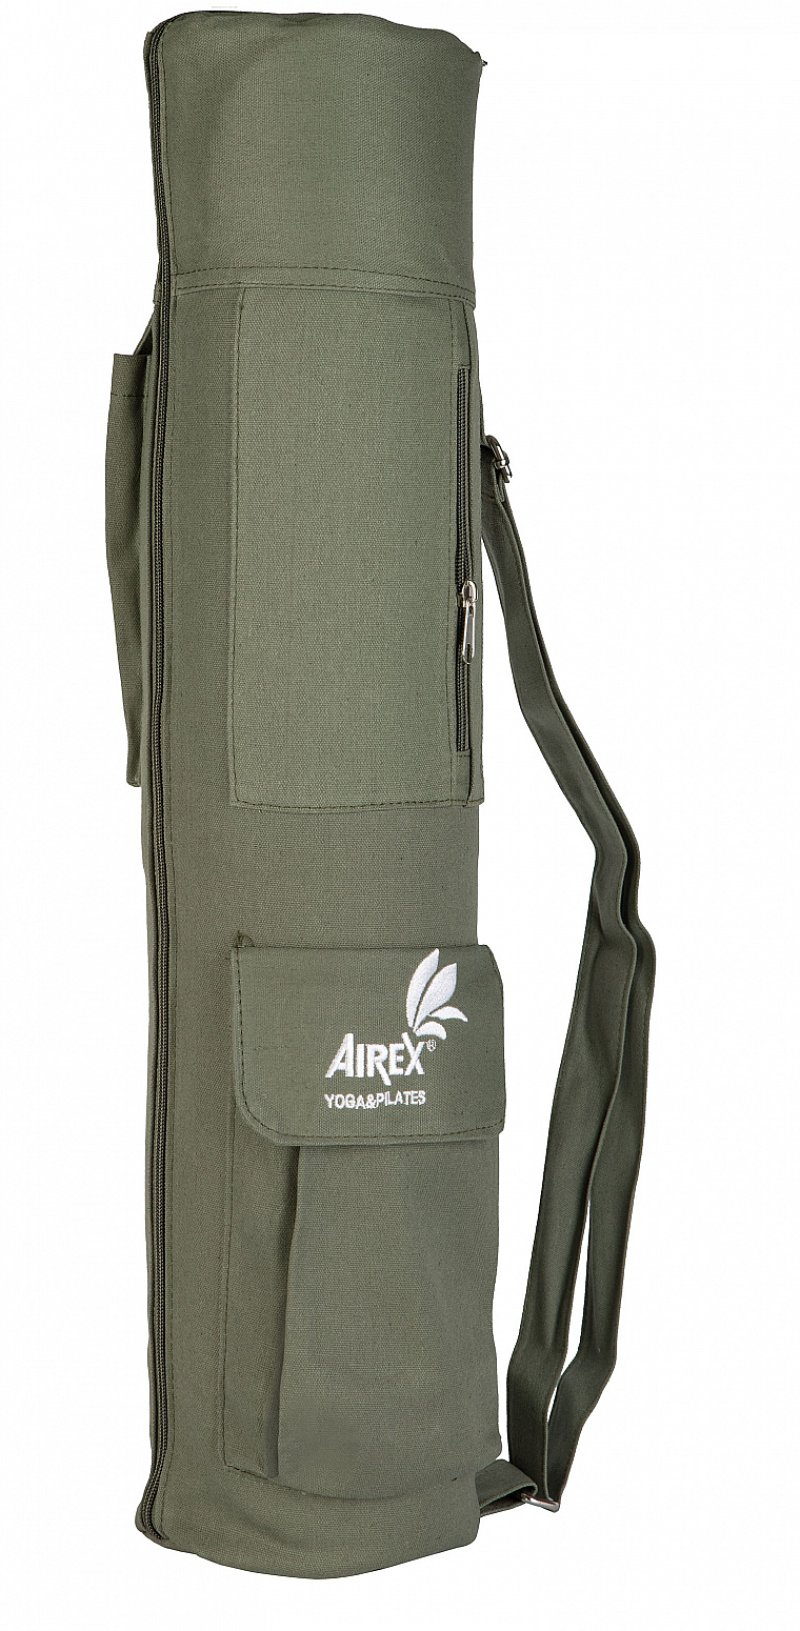 AIREX Yoga Carry Bag, Oliv, 100% Canvas